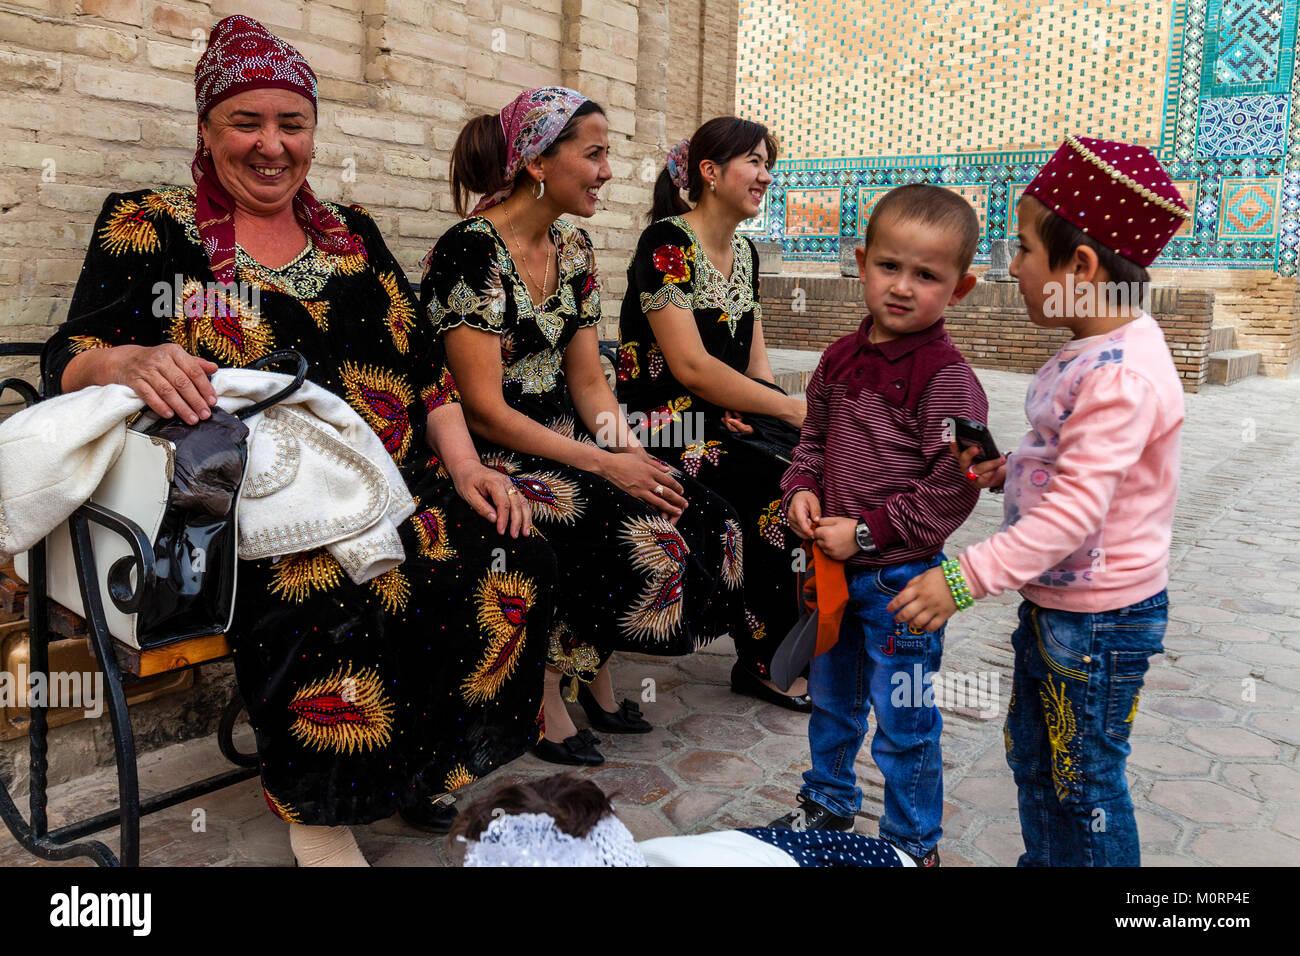 Uzbek Families Visiting The Shah-i-Zinda Mausoleum Complex, Samarkand, Uzbekistan - Stock Image